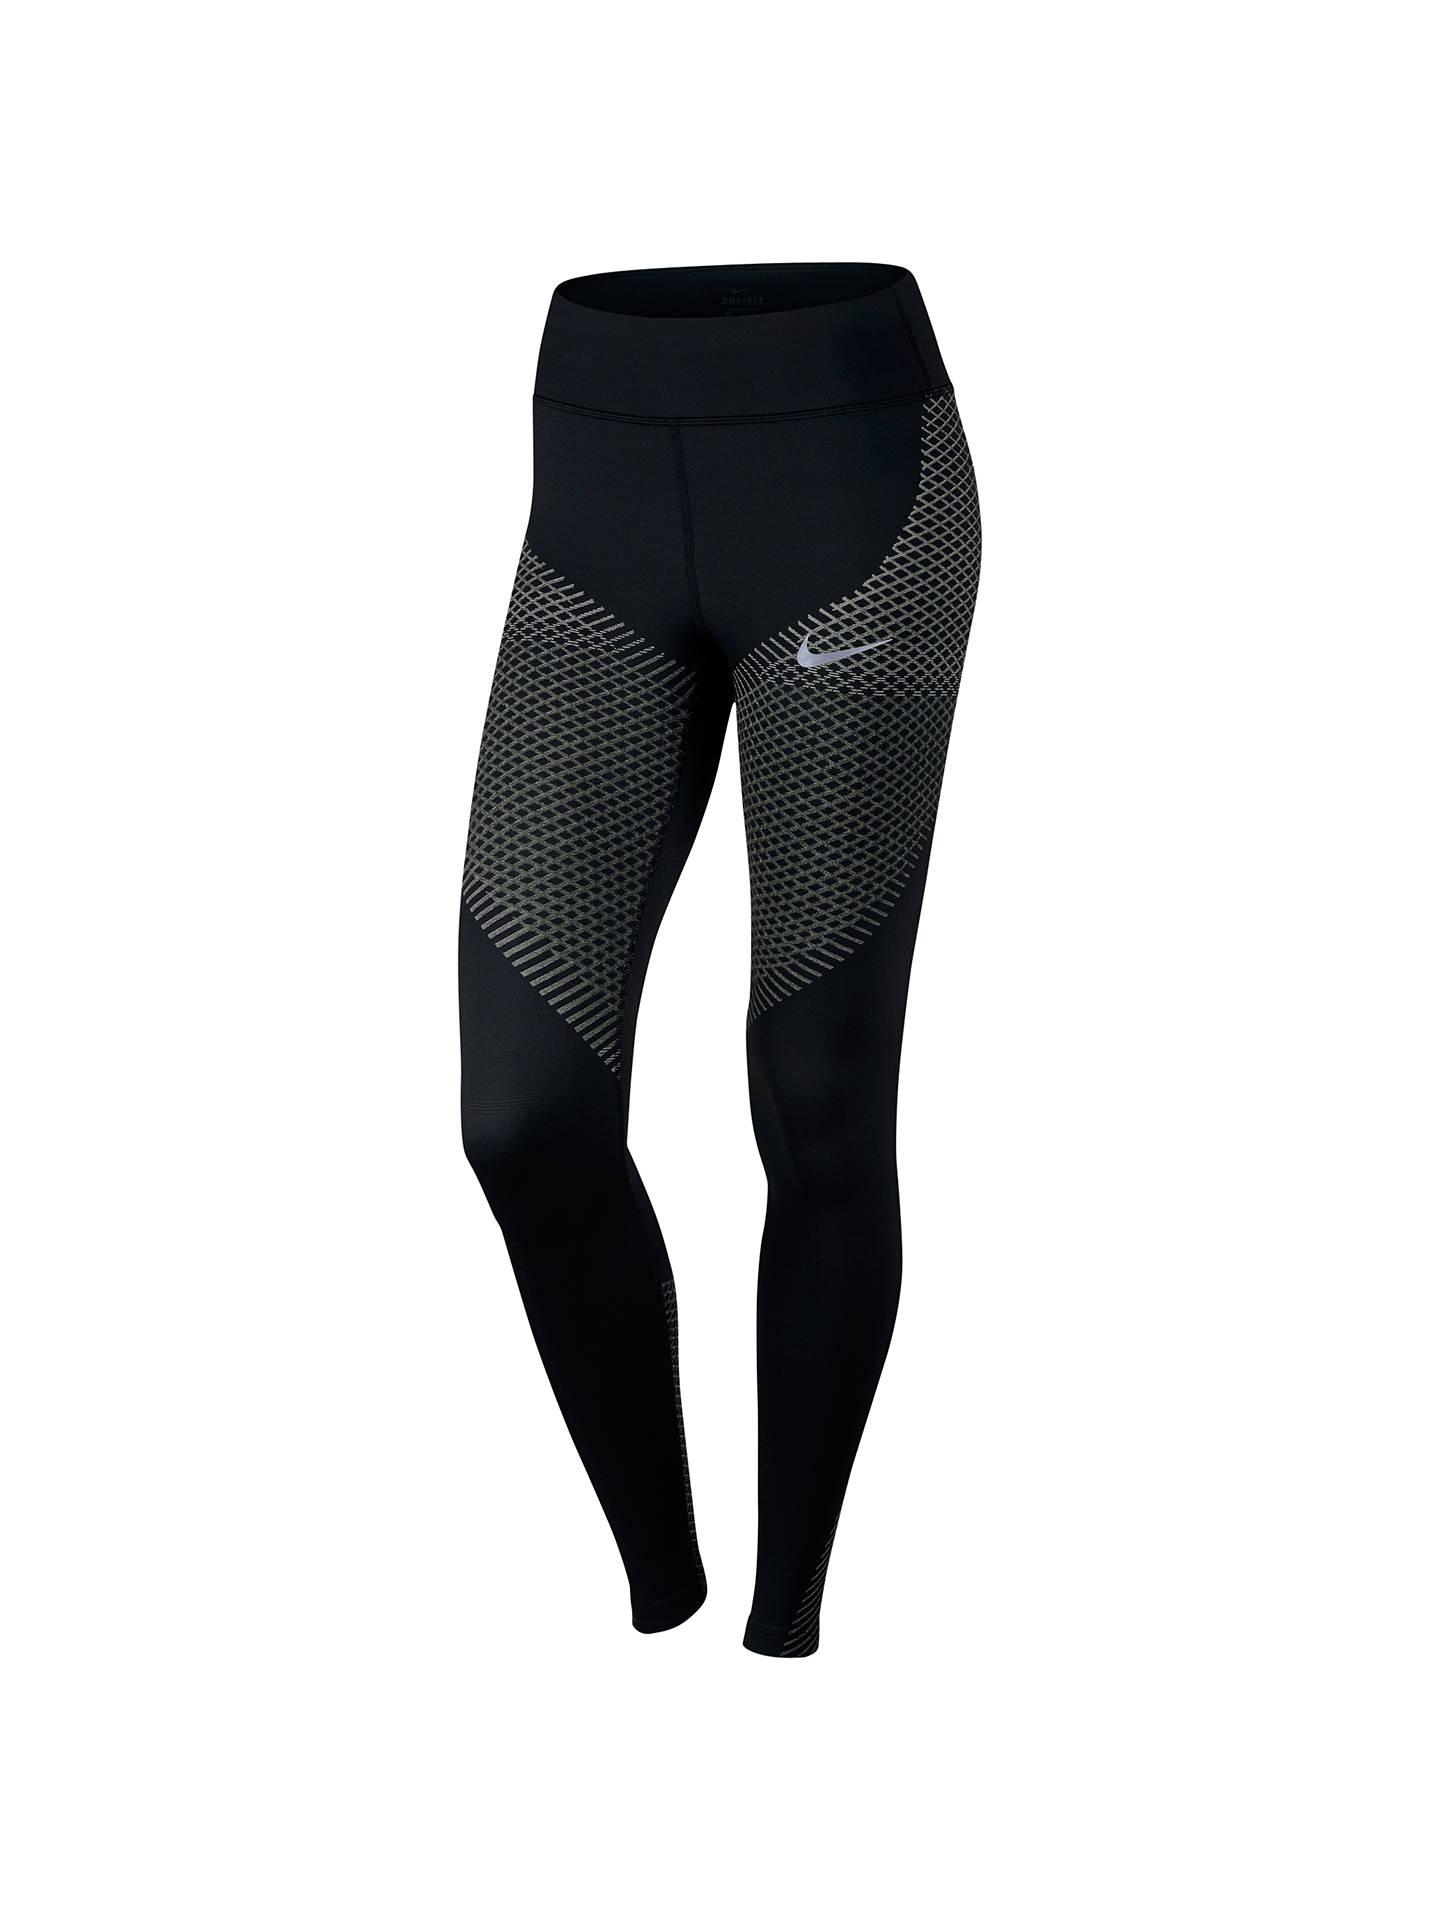 134c107180b935 Buy Nike Zonal Strength Print Running Tights, Black/Tumbled Grey, XS Online  at ...